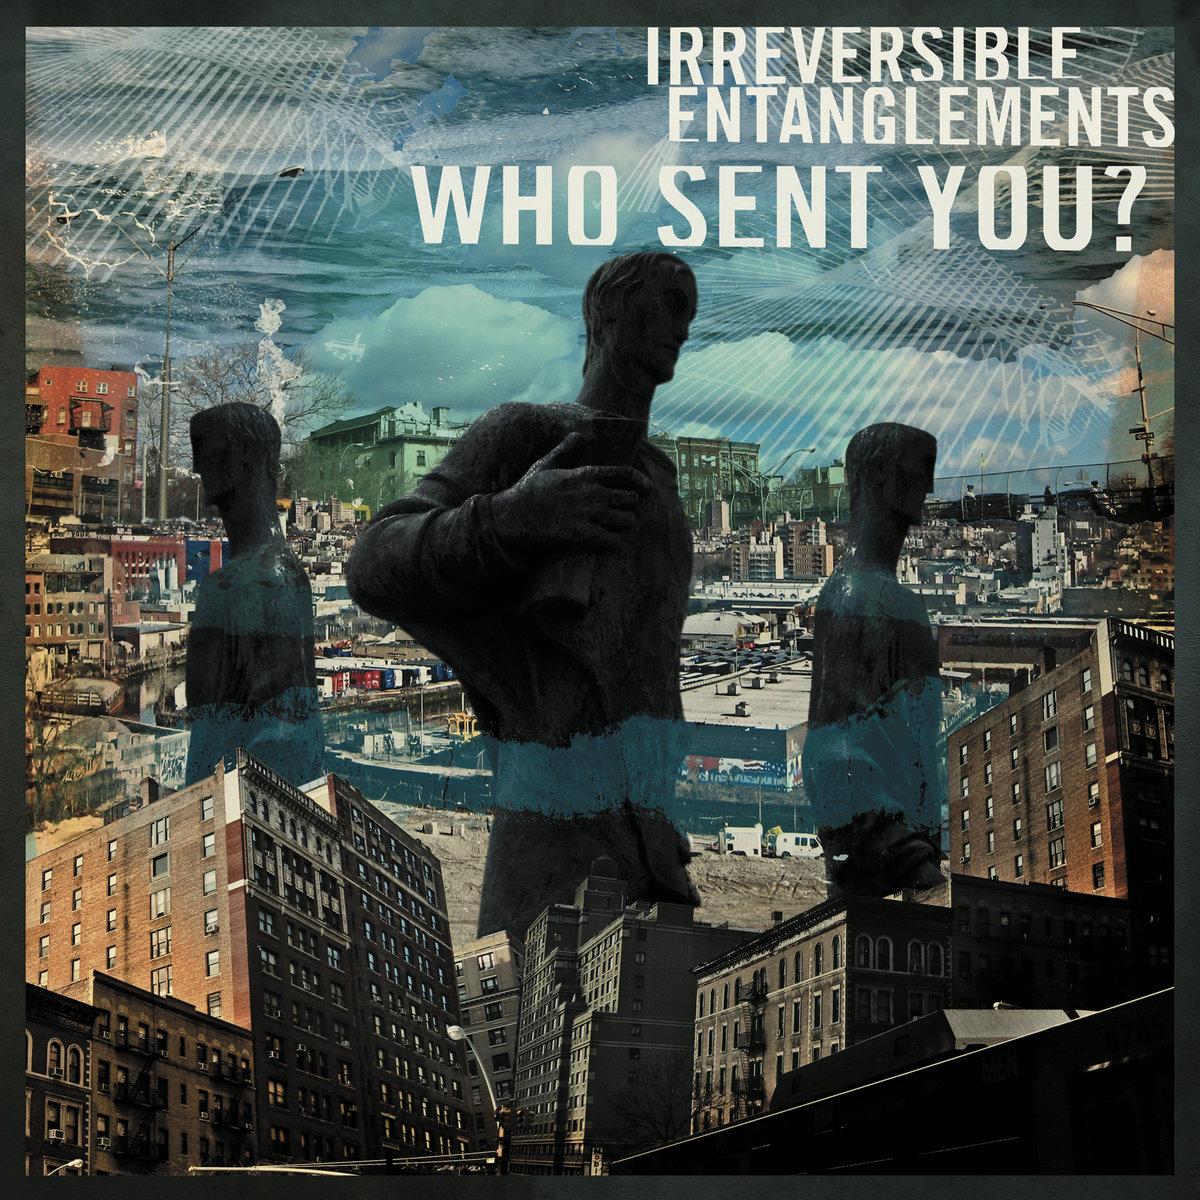 Irreversible Entanglements : Who Sent You